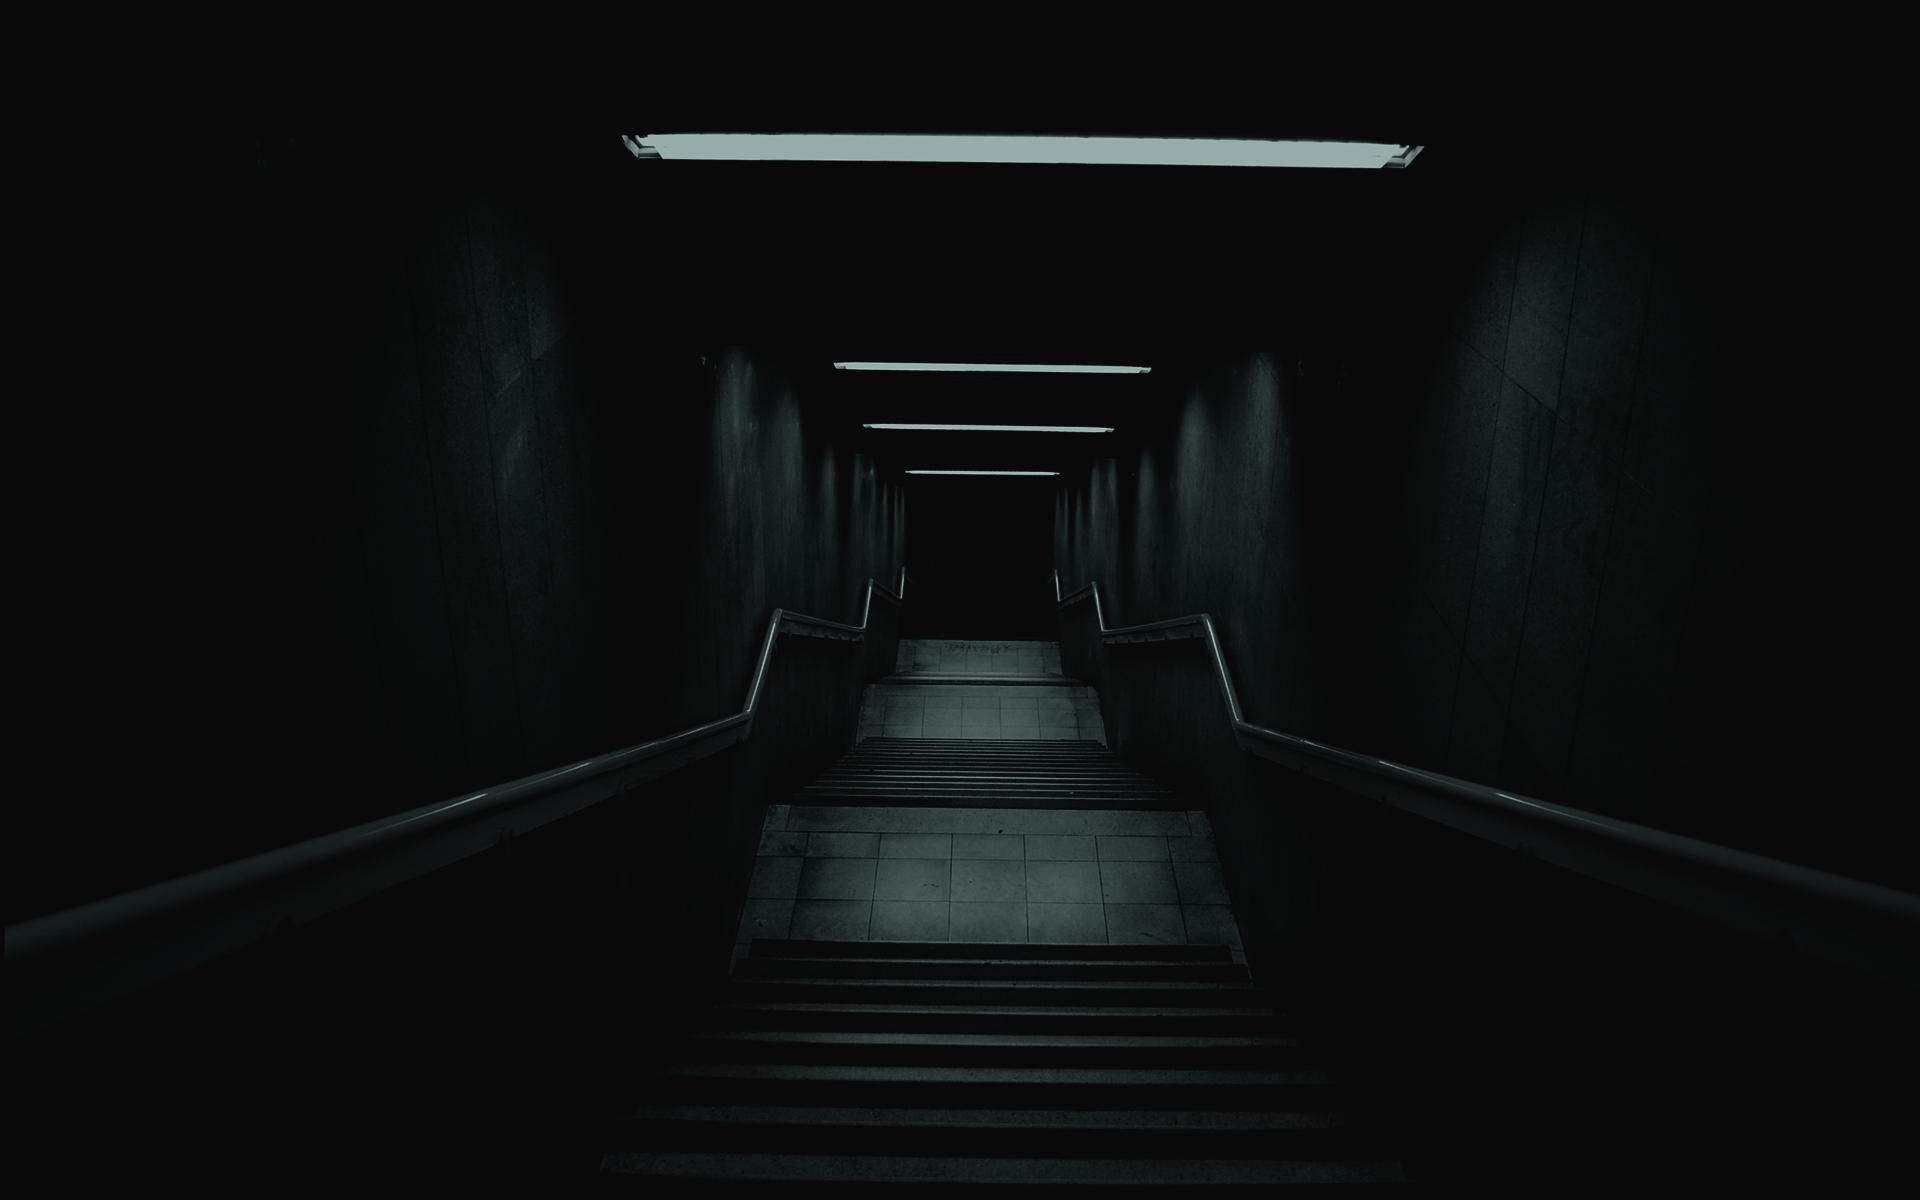 Dark Desktop Wallpapers and Backgrounds - WallpaperSafari